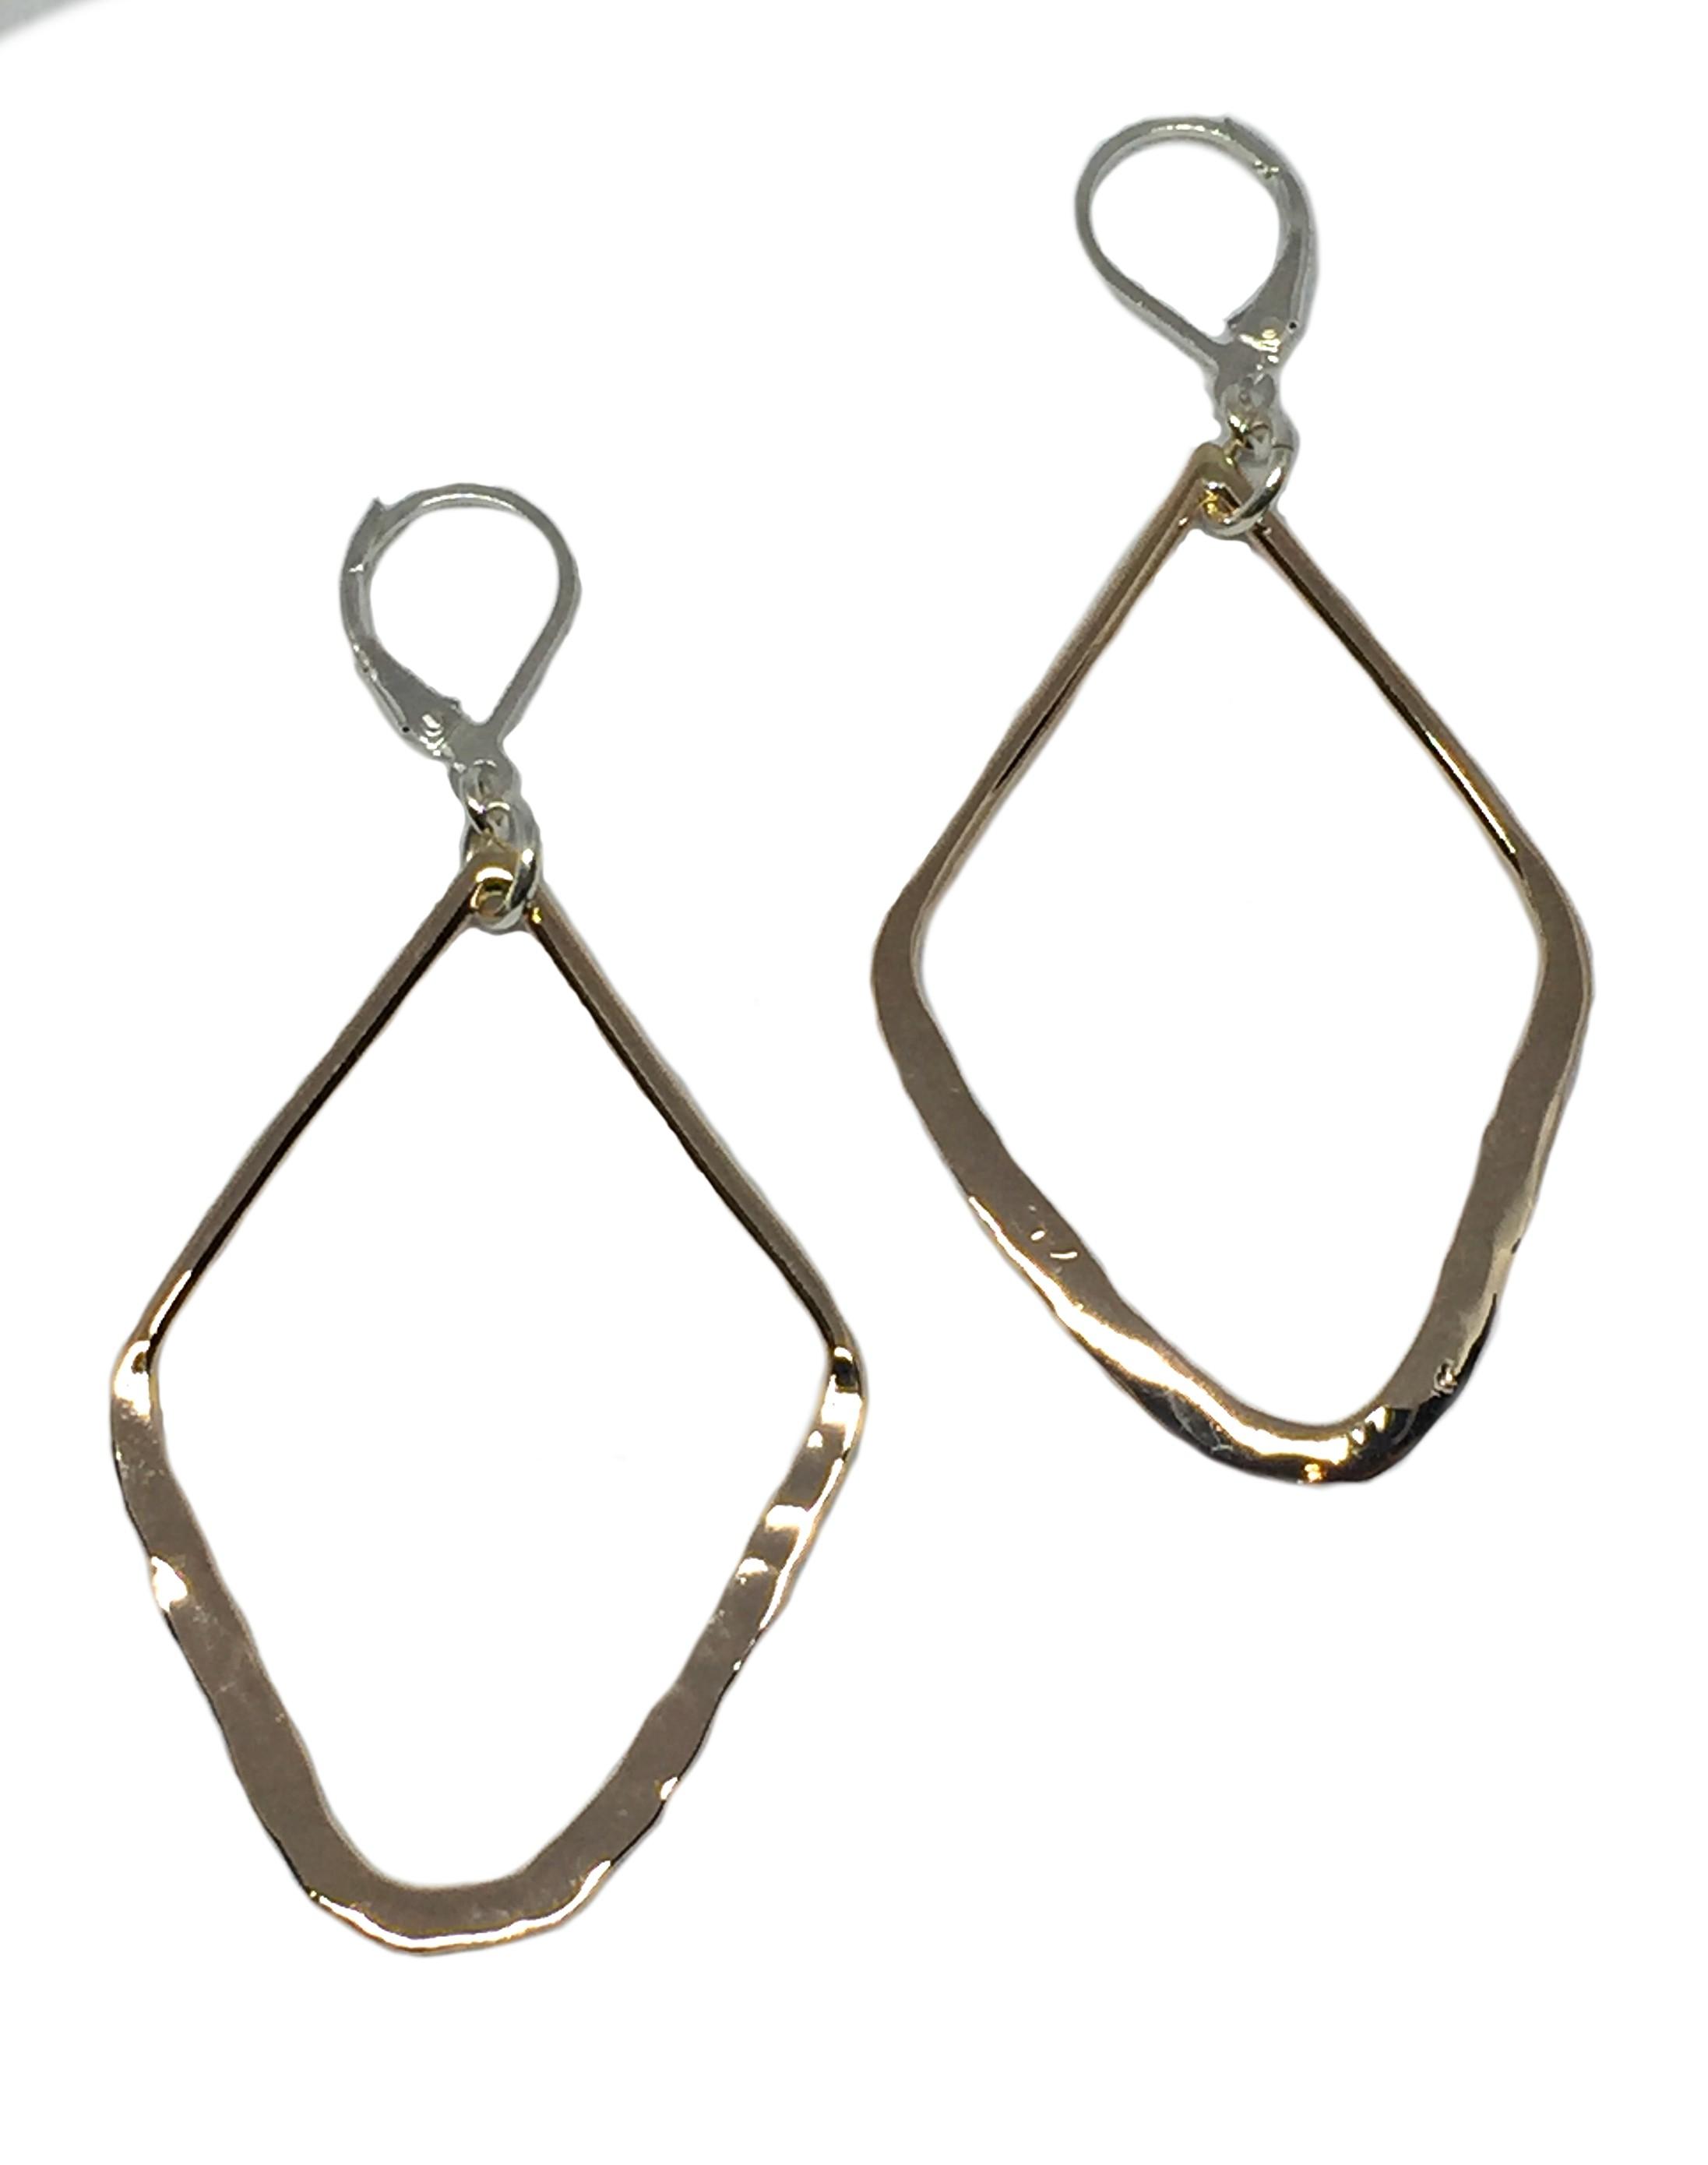 Bronze earrings by Karyn Chopik | Effusion Art Gallery + Cast Glass Studio, Invermere BC